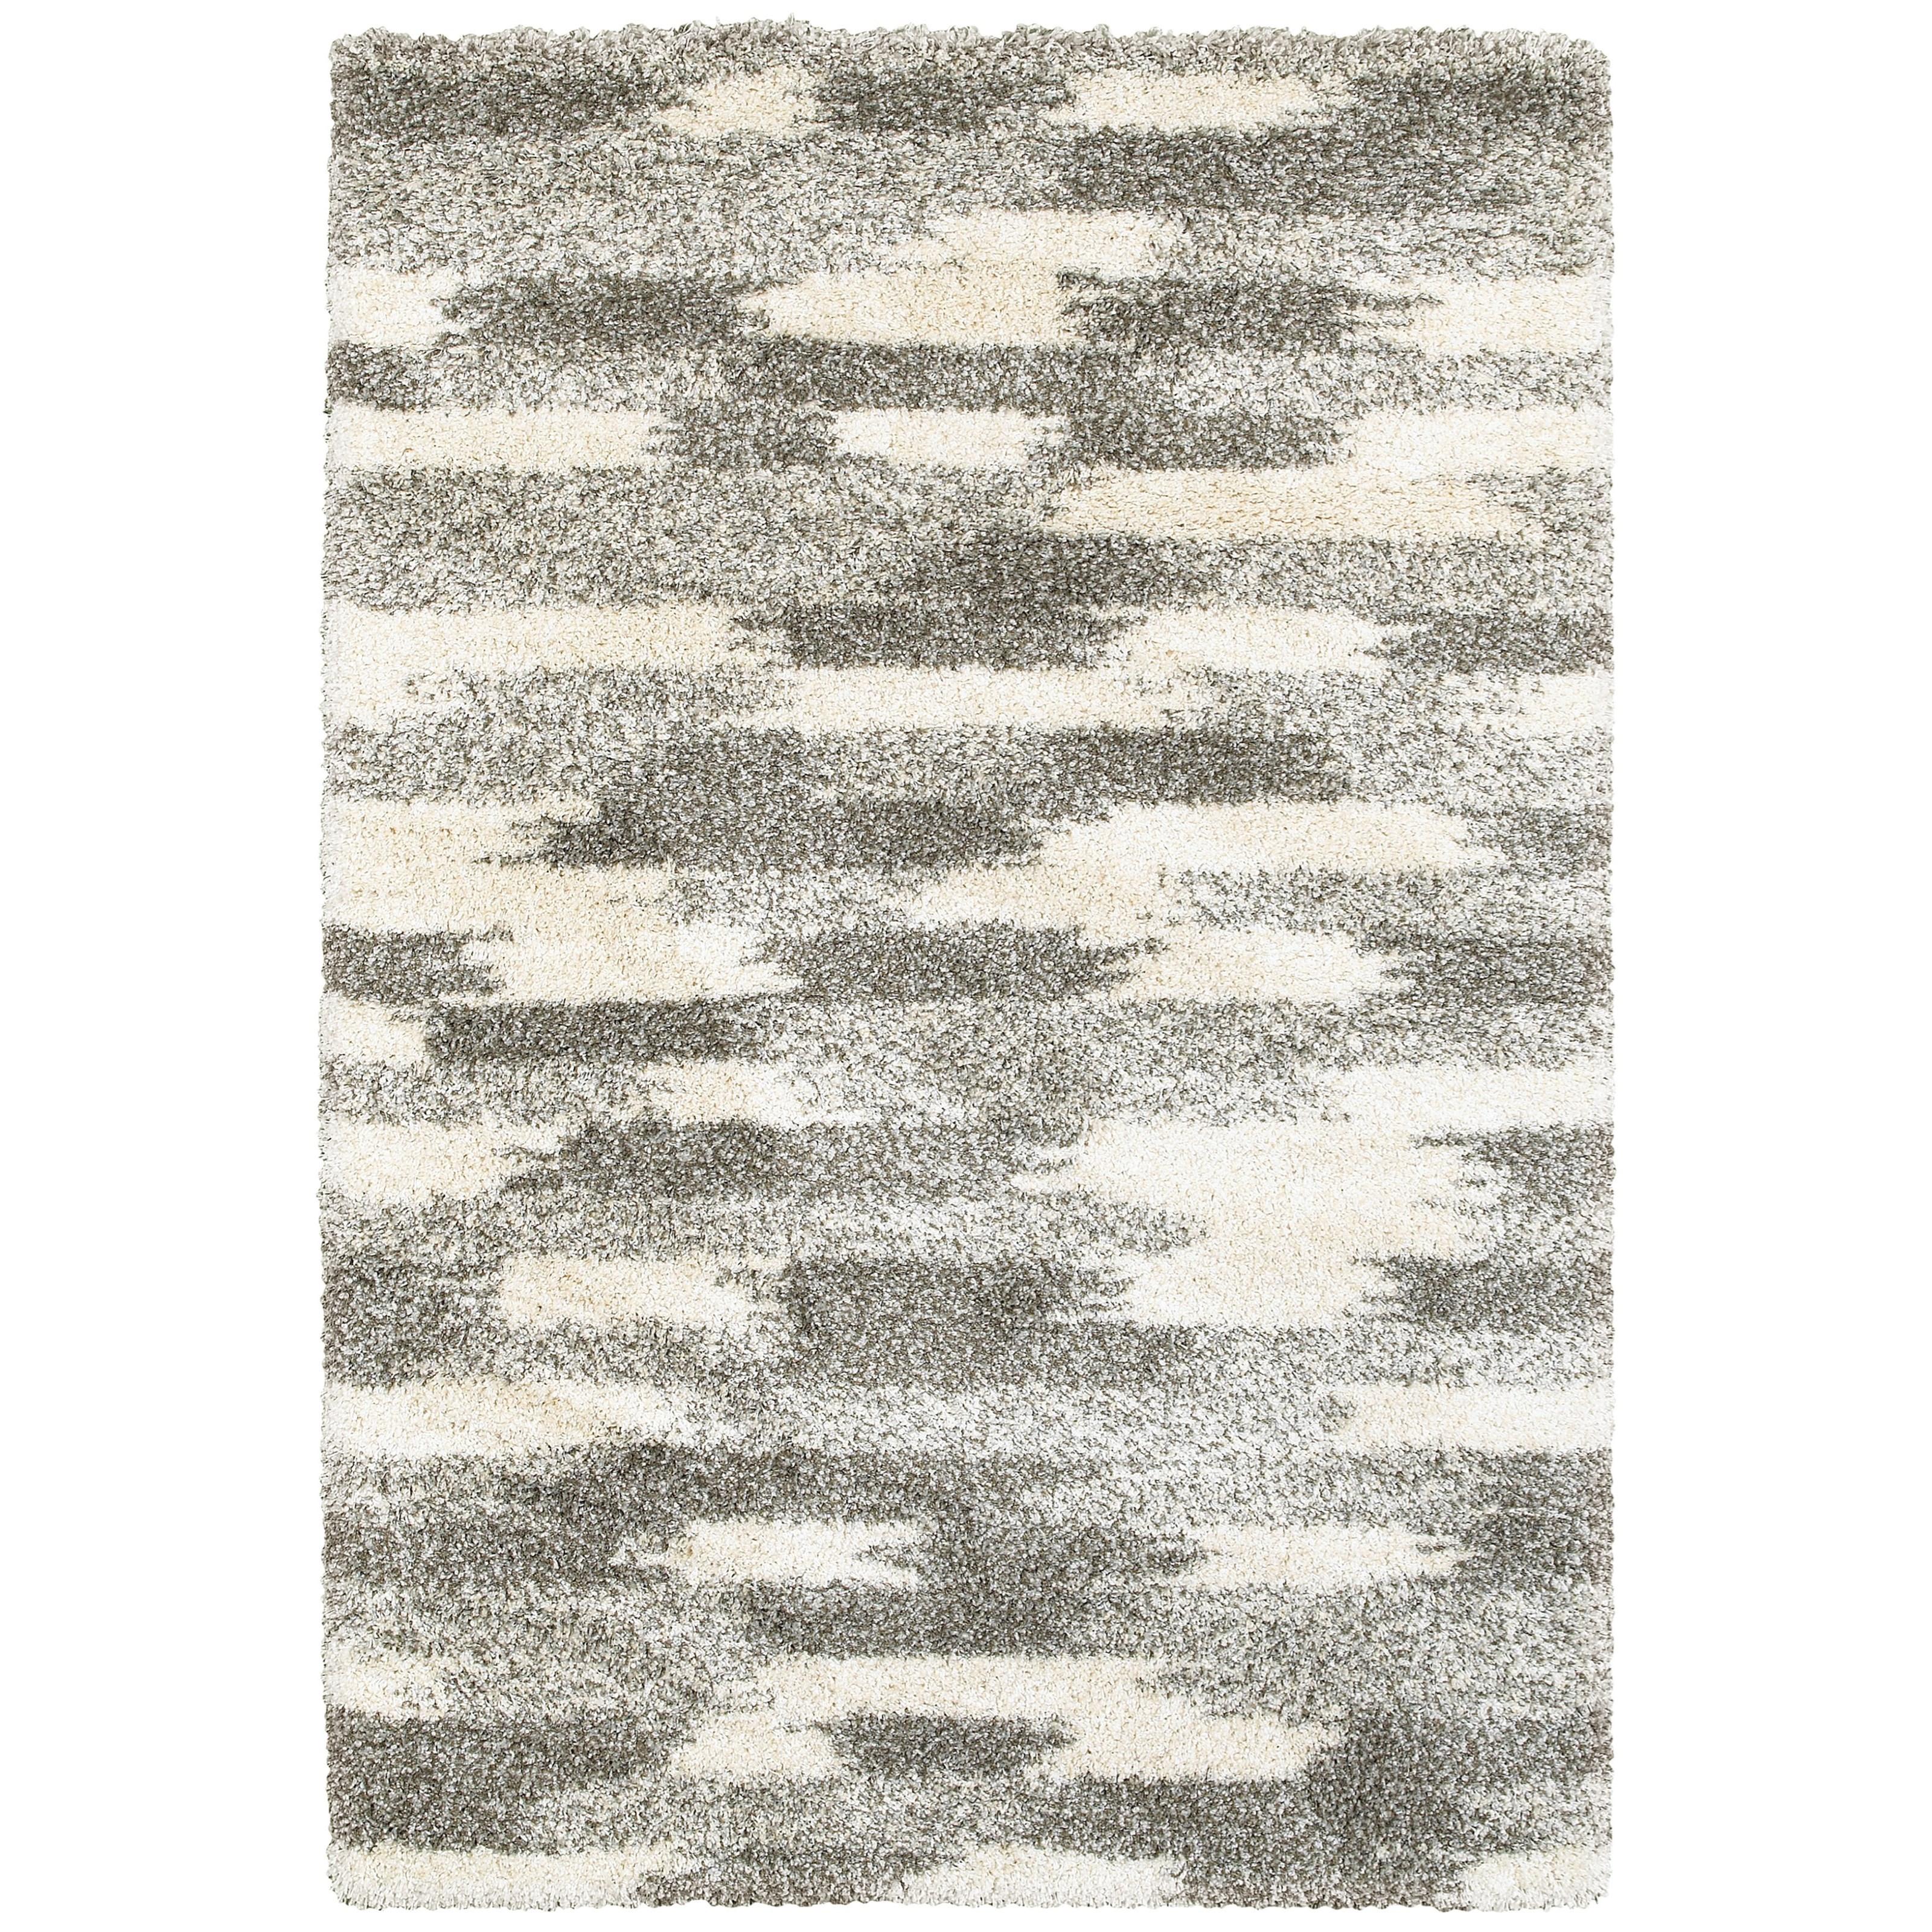 "Henderson 7'10"" X 10'10"" Rug by Oriental Weavers at HomeWorld Furniture"